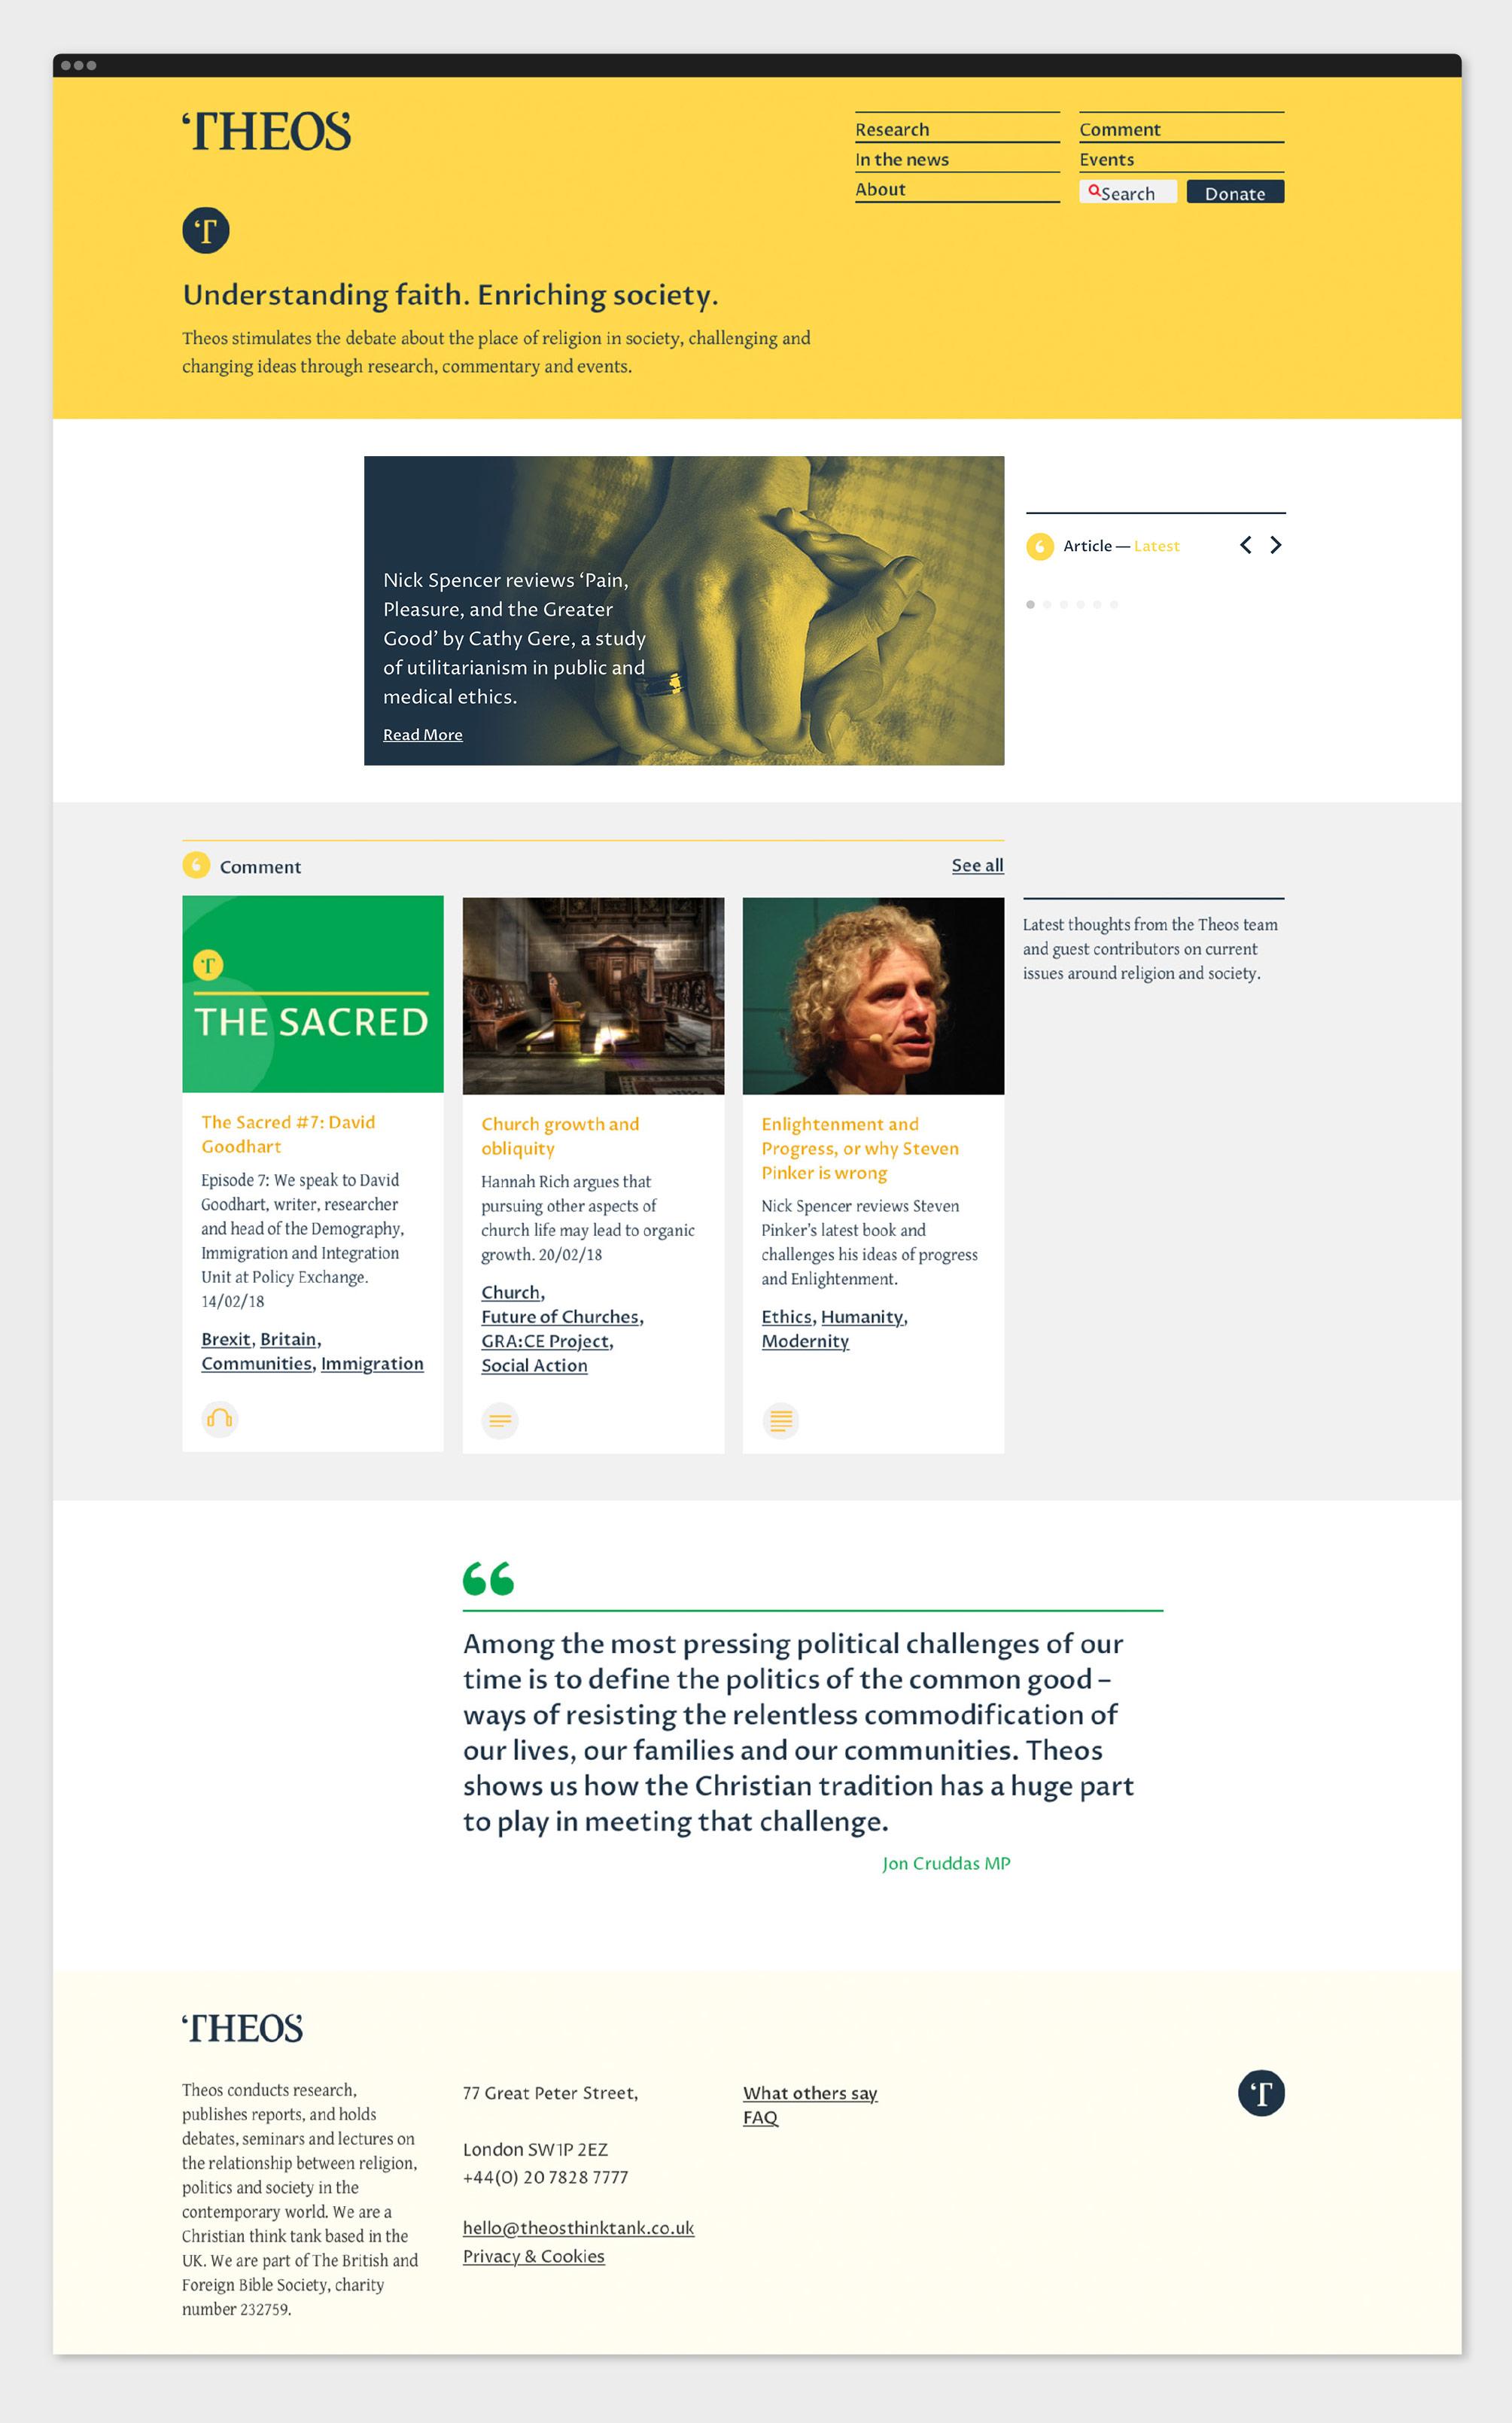 Theos homepage